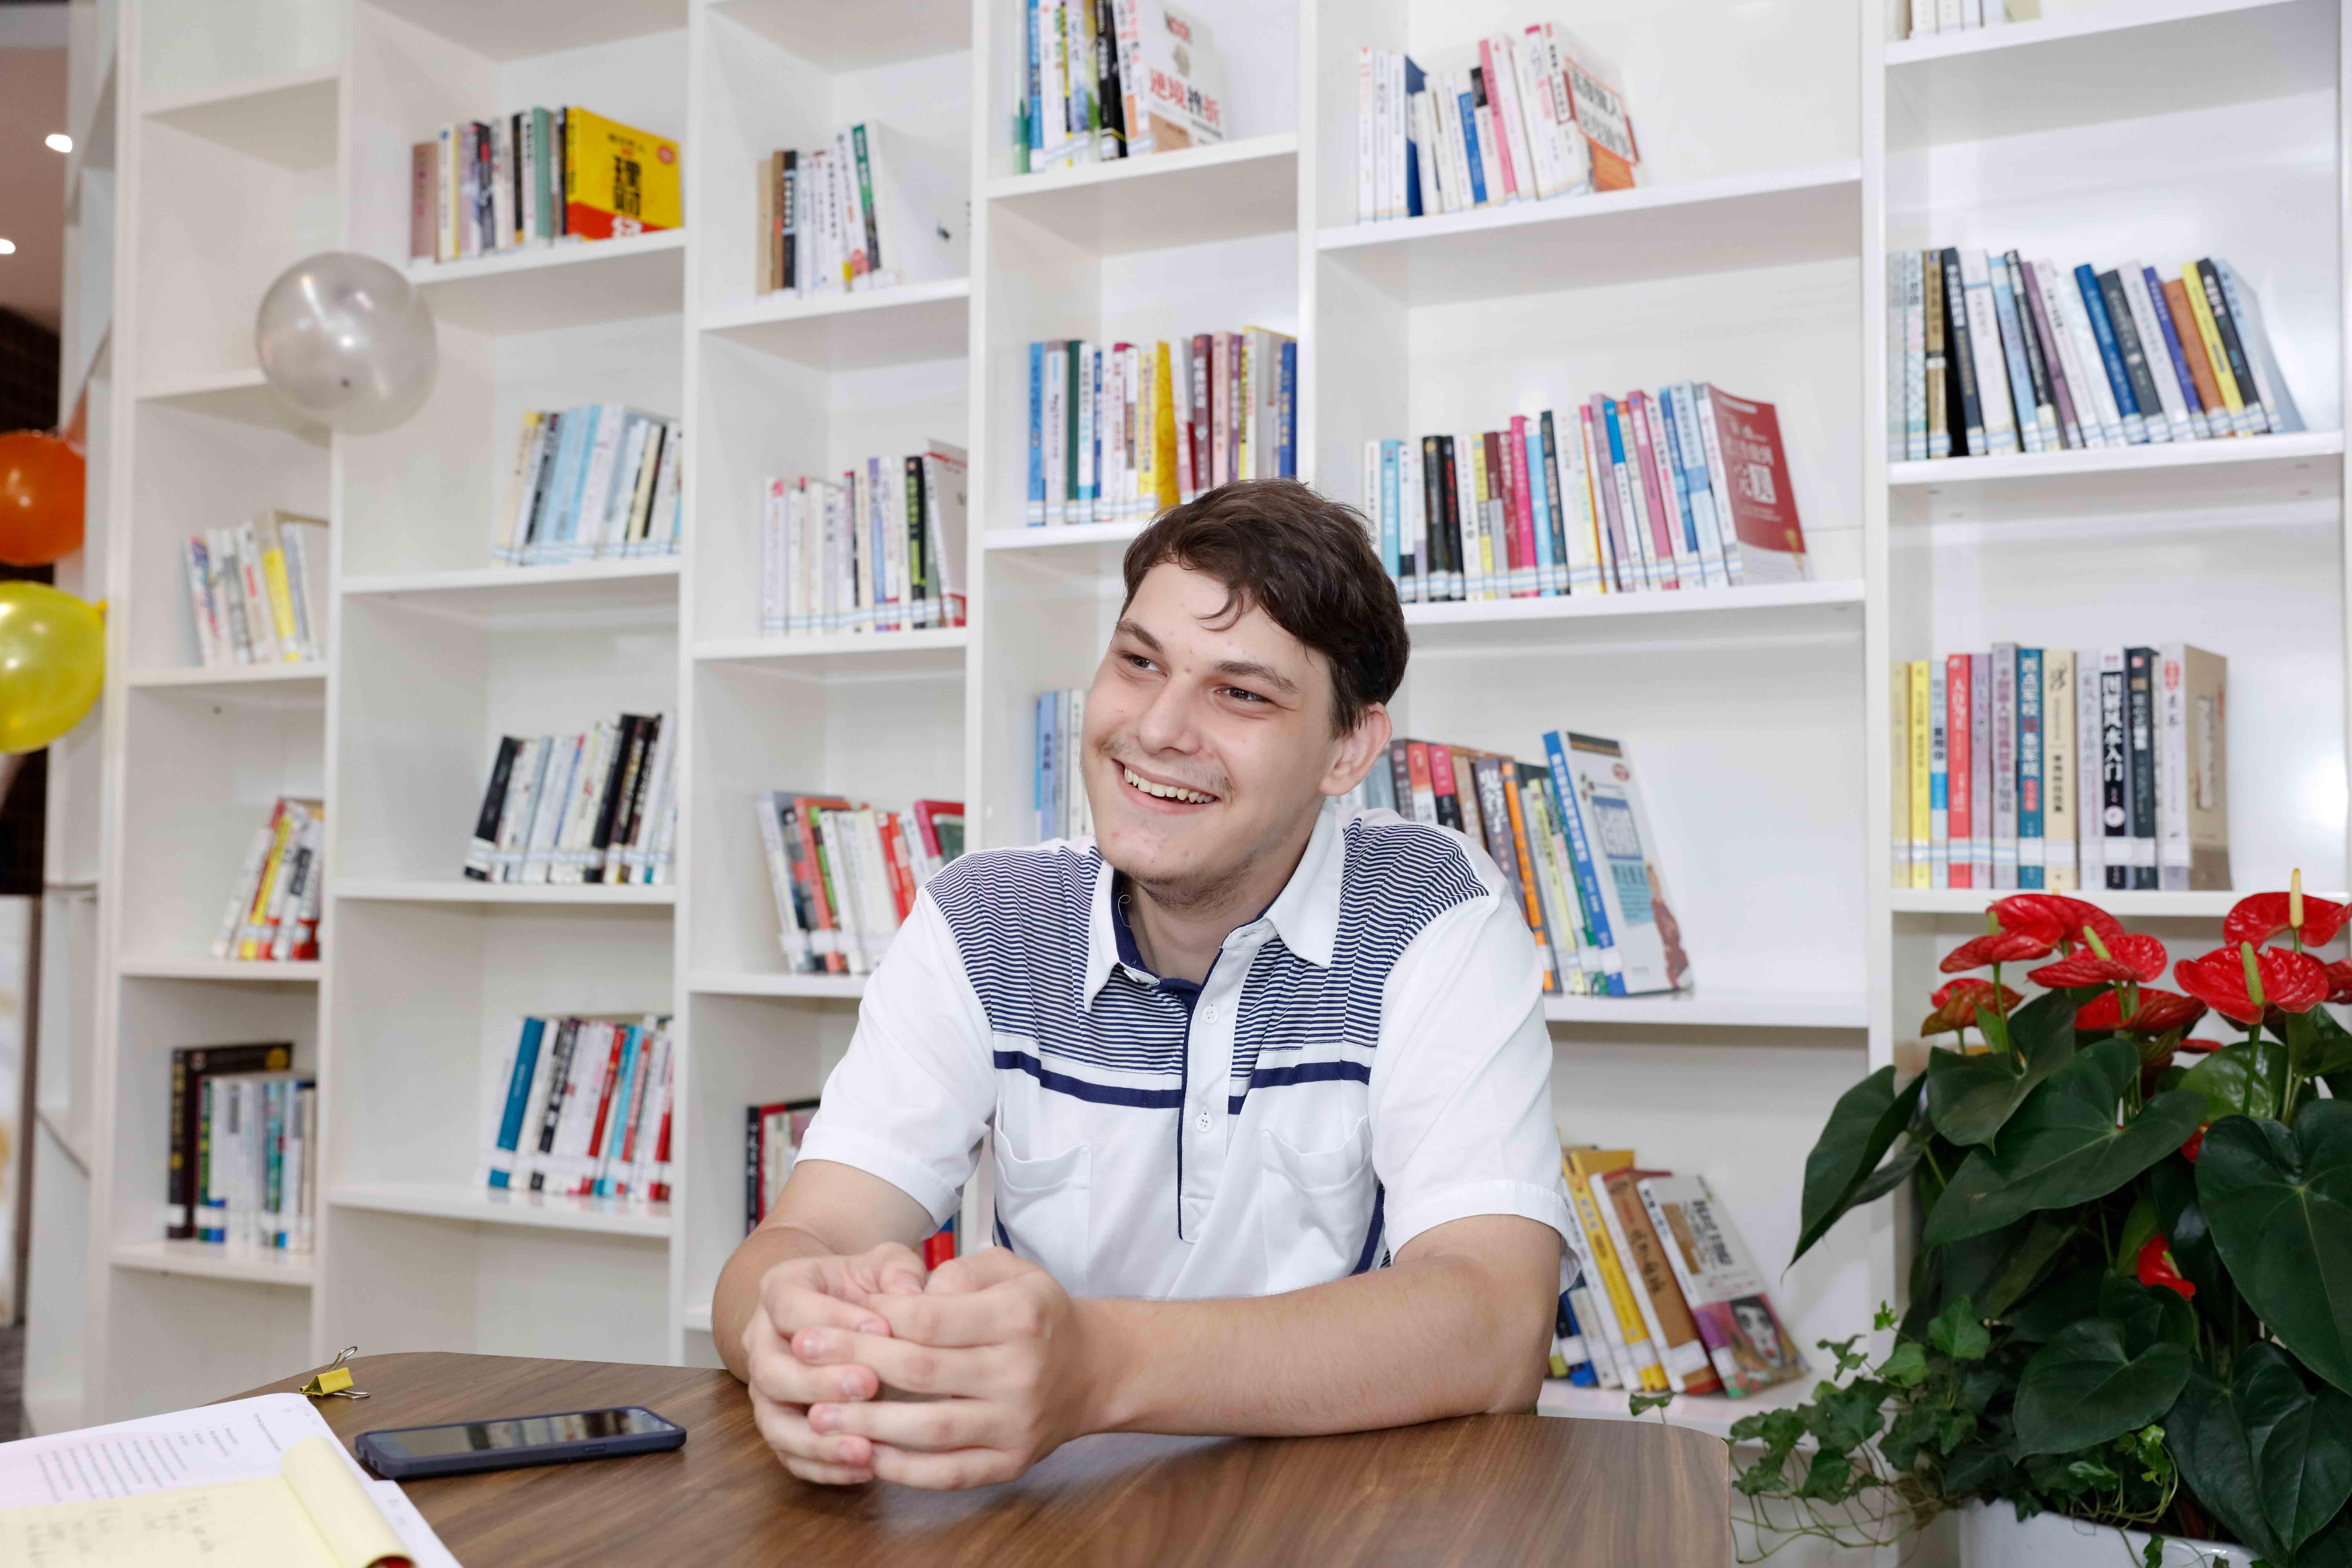 István Zsombó –Talented Hungarian Teen sets sights on Shenzhen future